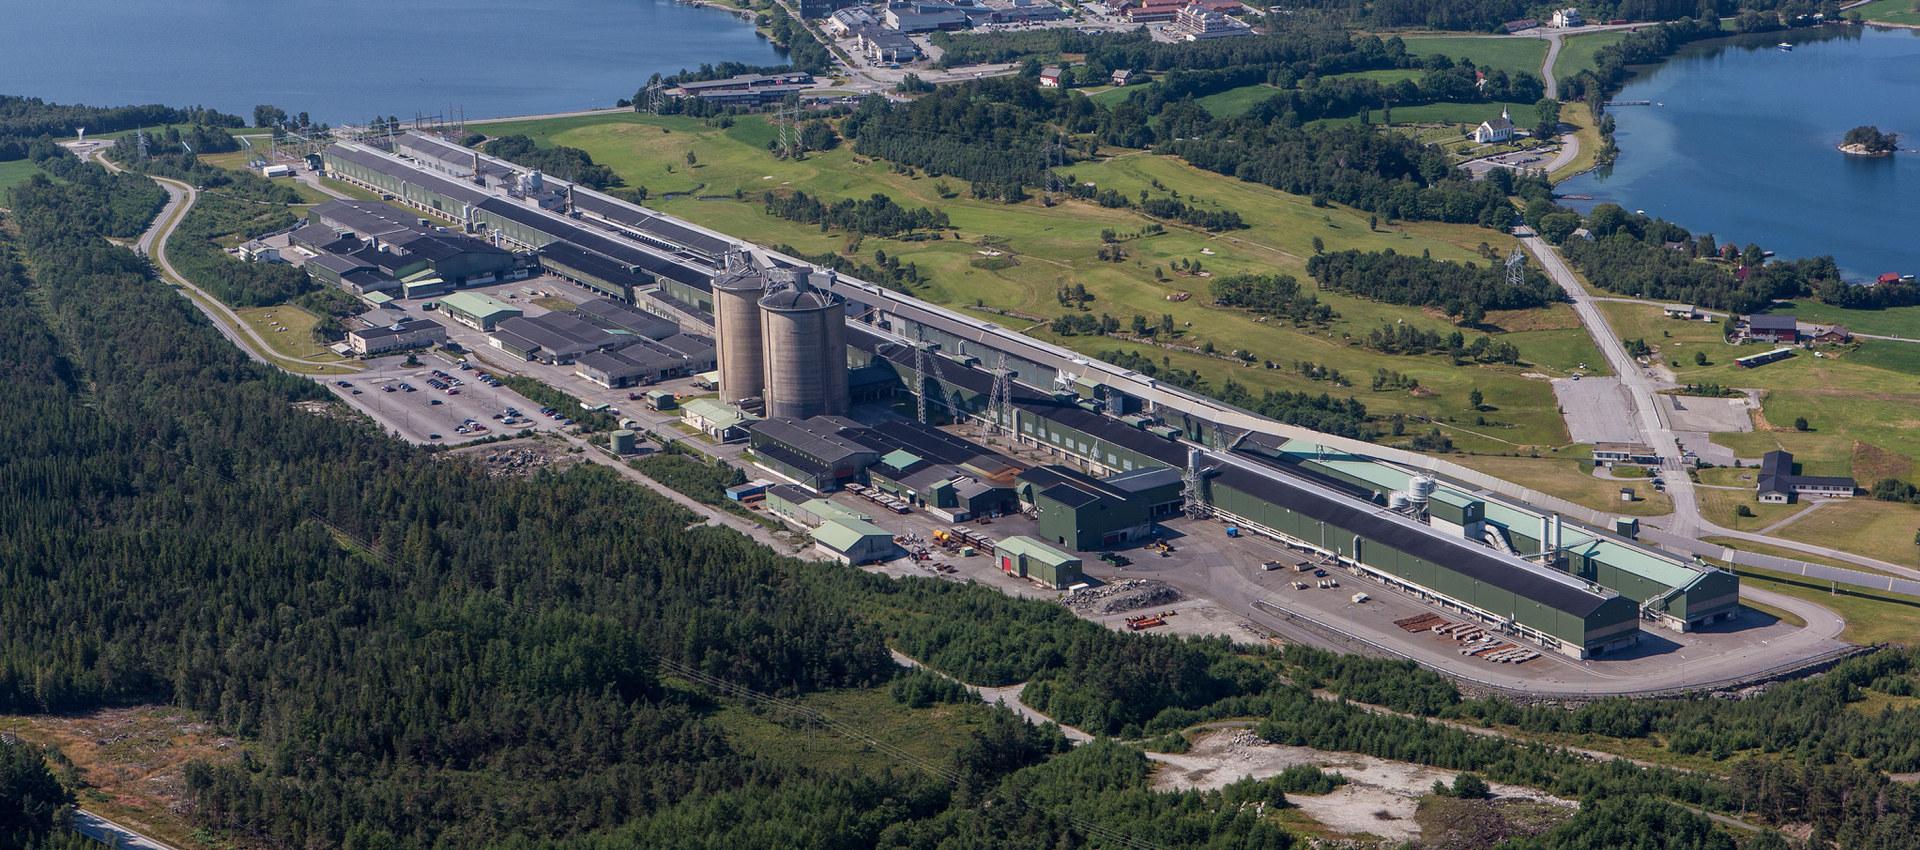 Hydro på Husnes. Foto: Norsk Hydro